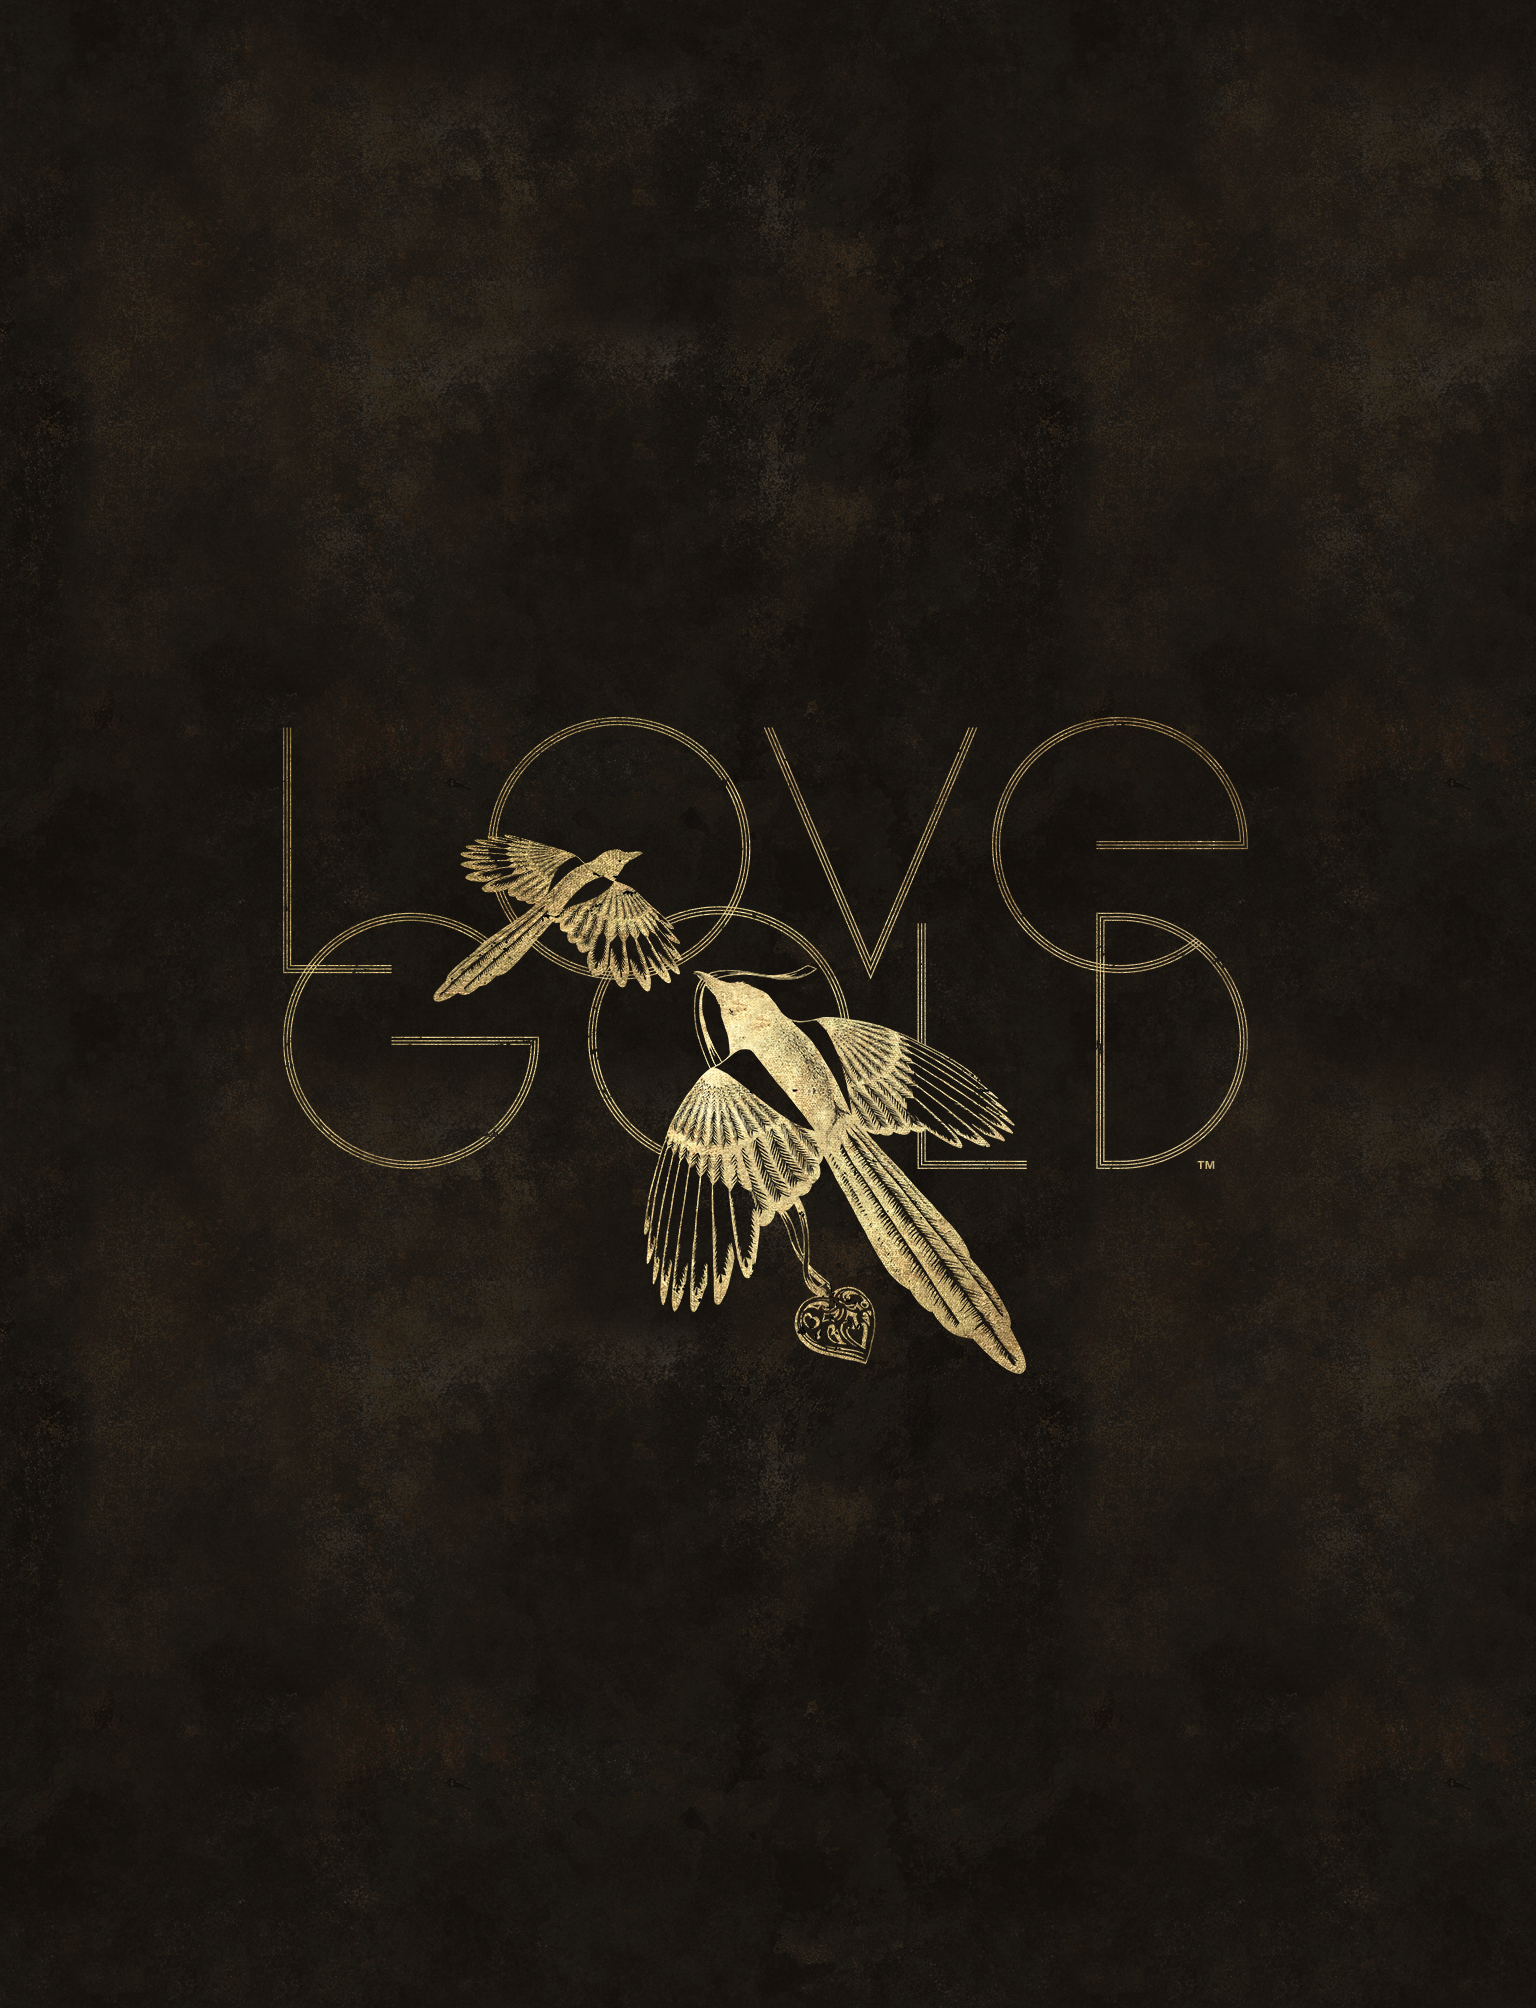 Lovegold